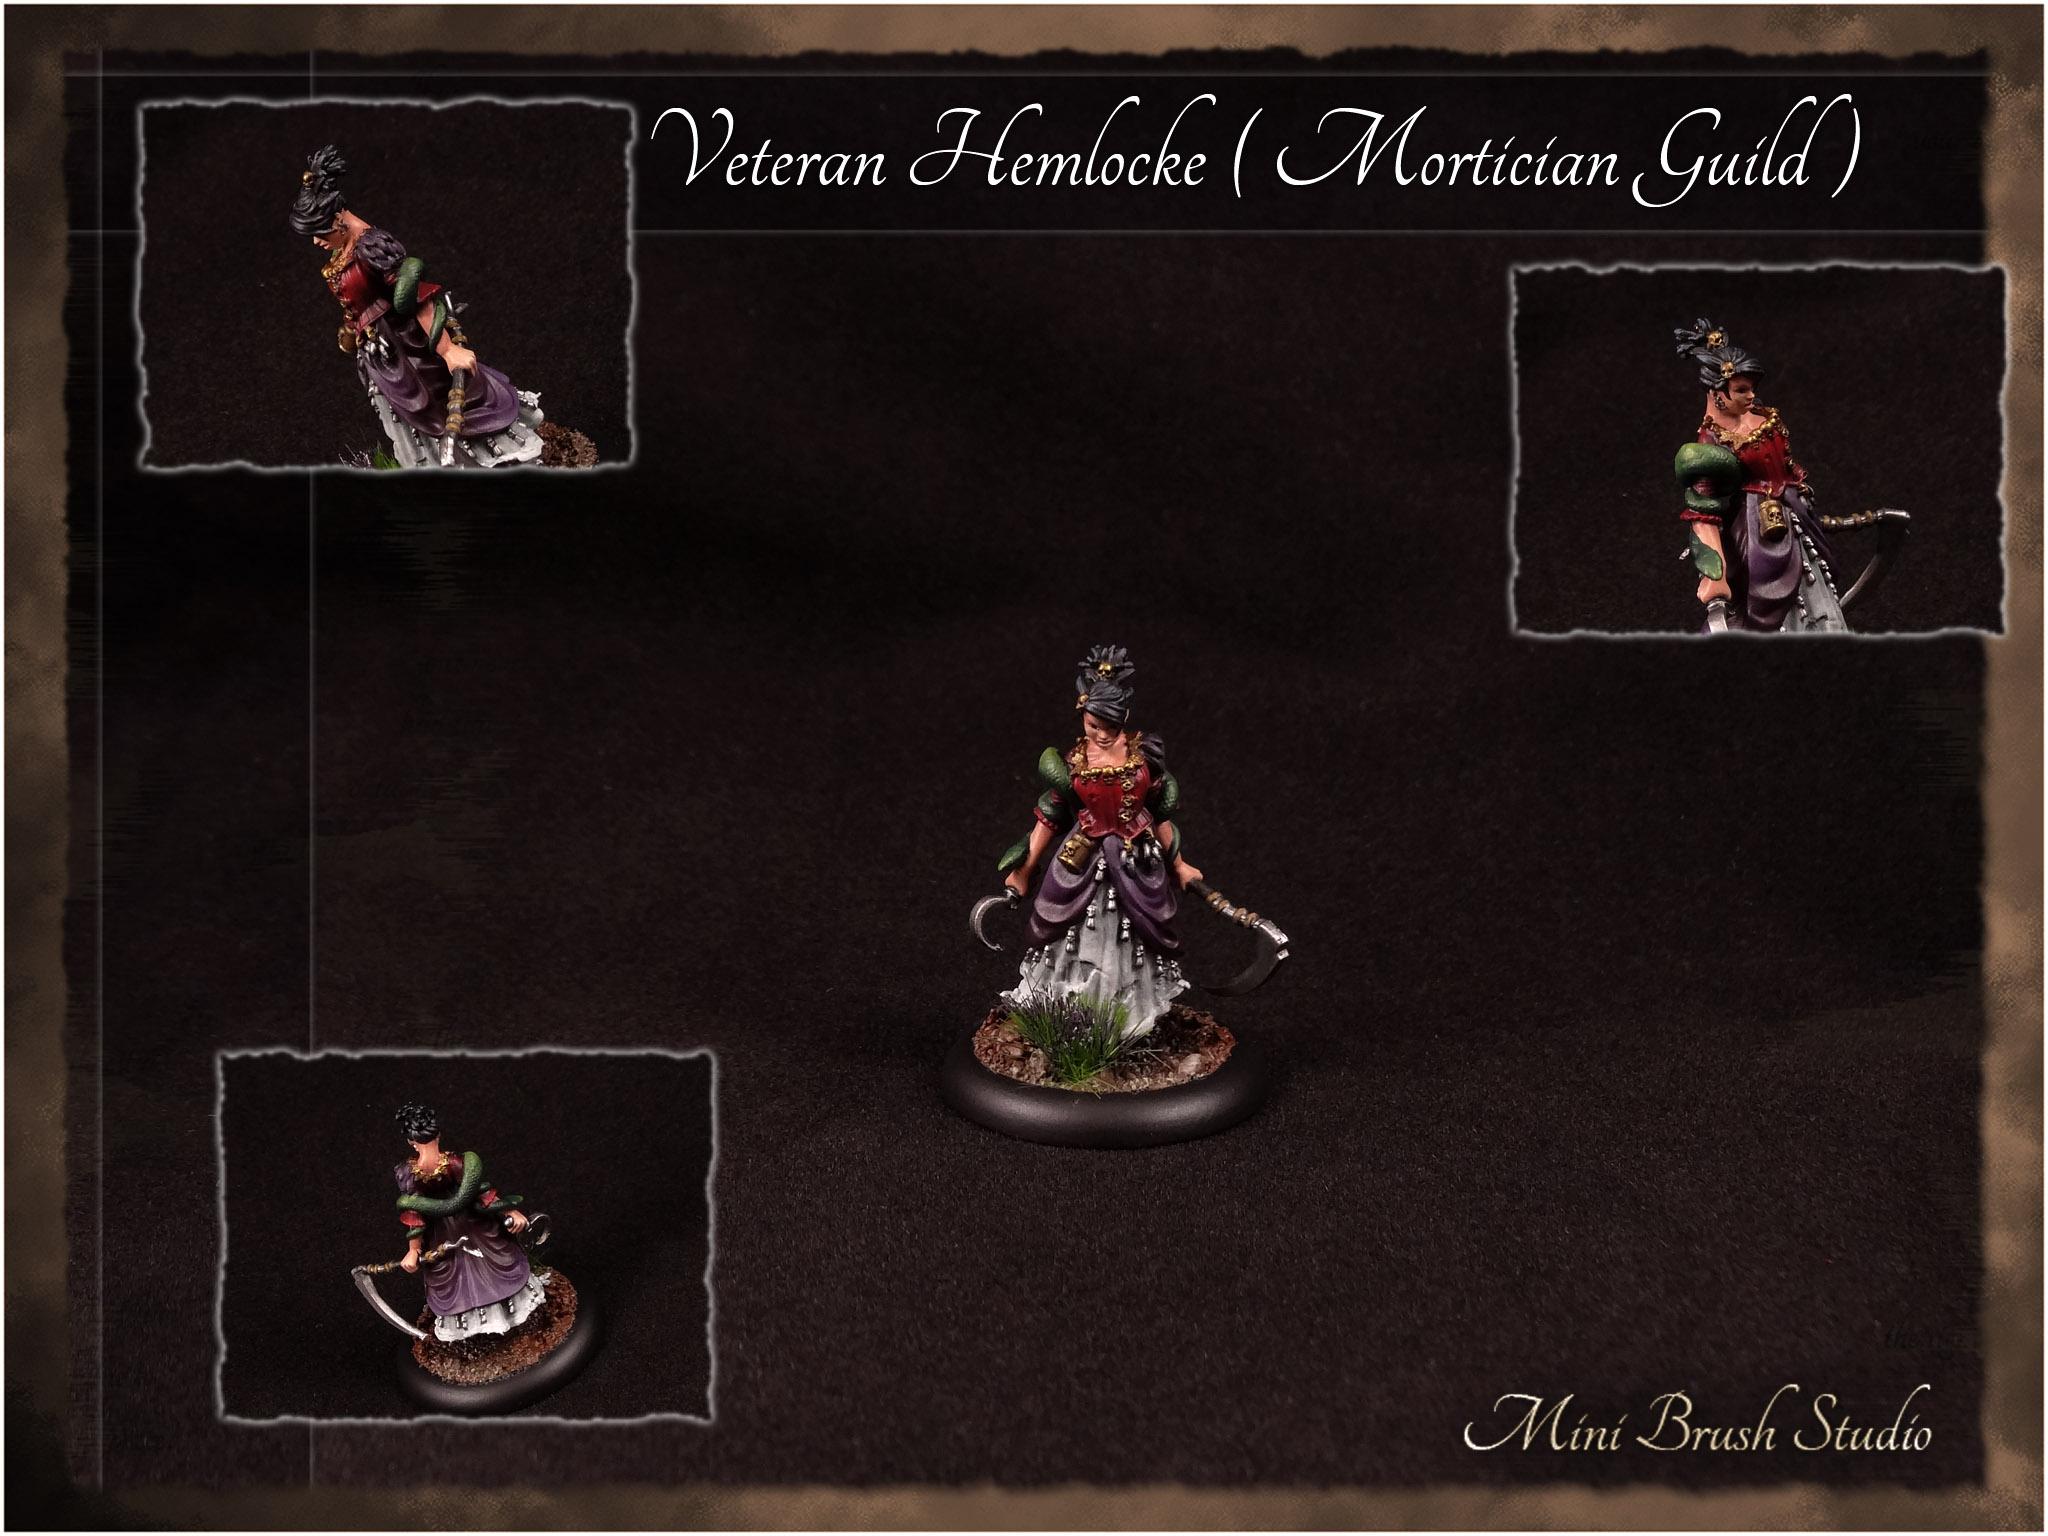 Veteran Hemlocke ( Mortician Guild ) 1 v7.jpg